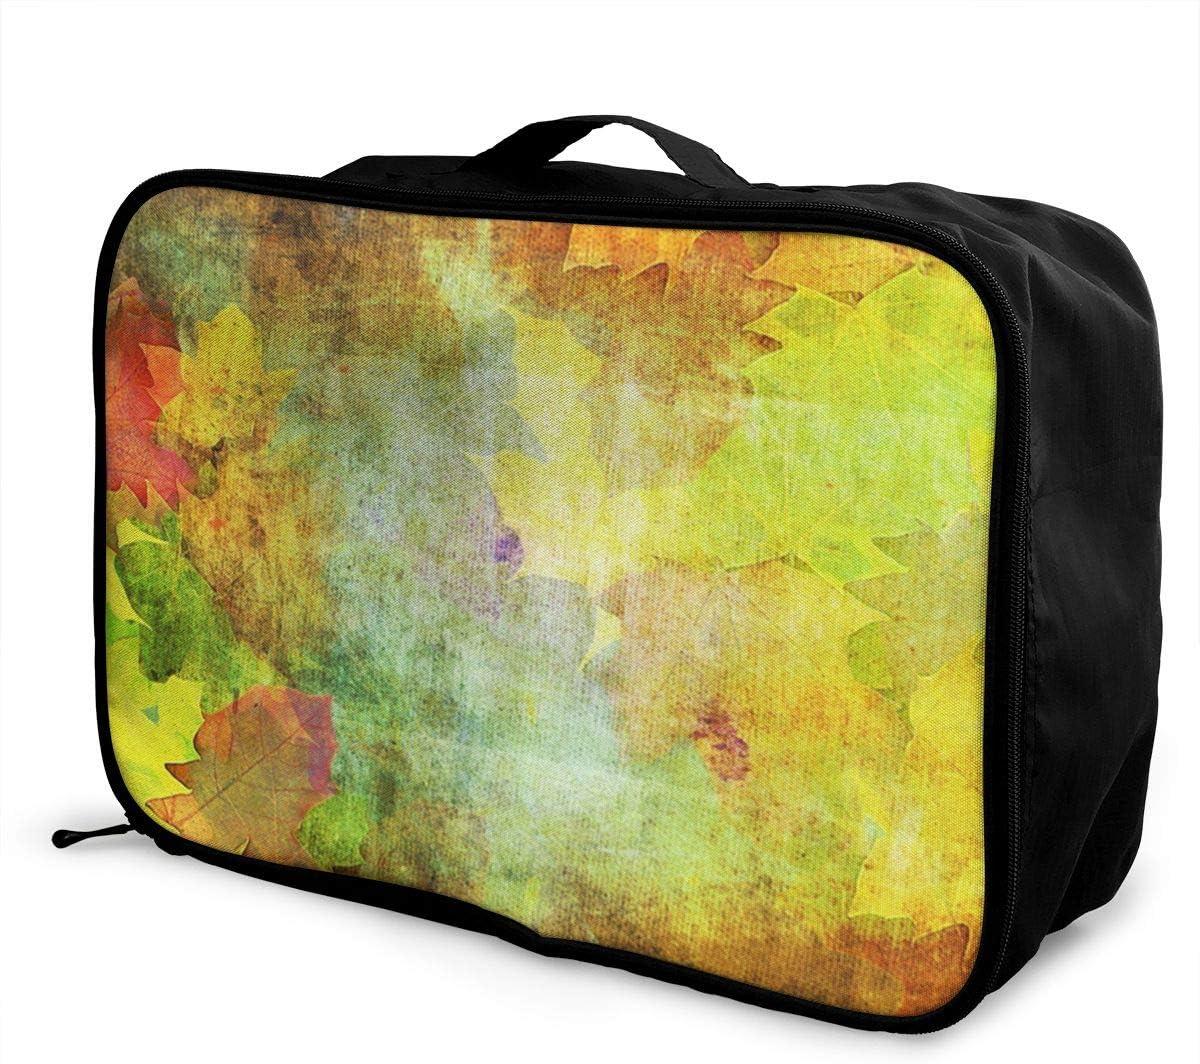 October/_leaves Travel Carry-on Luggage Weekender Bag Overnight Tote Flight Duffel In Trolley Handle